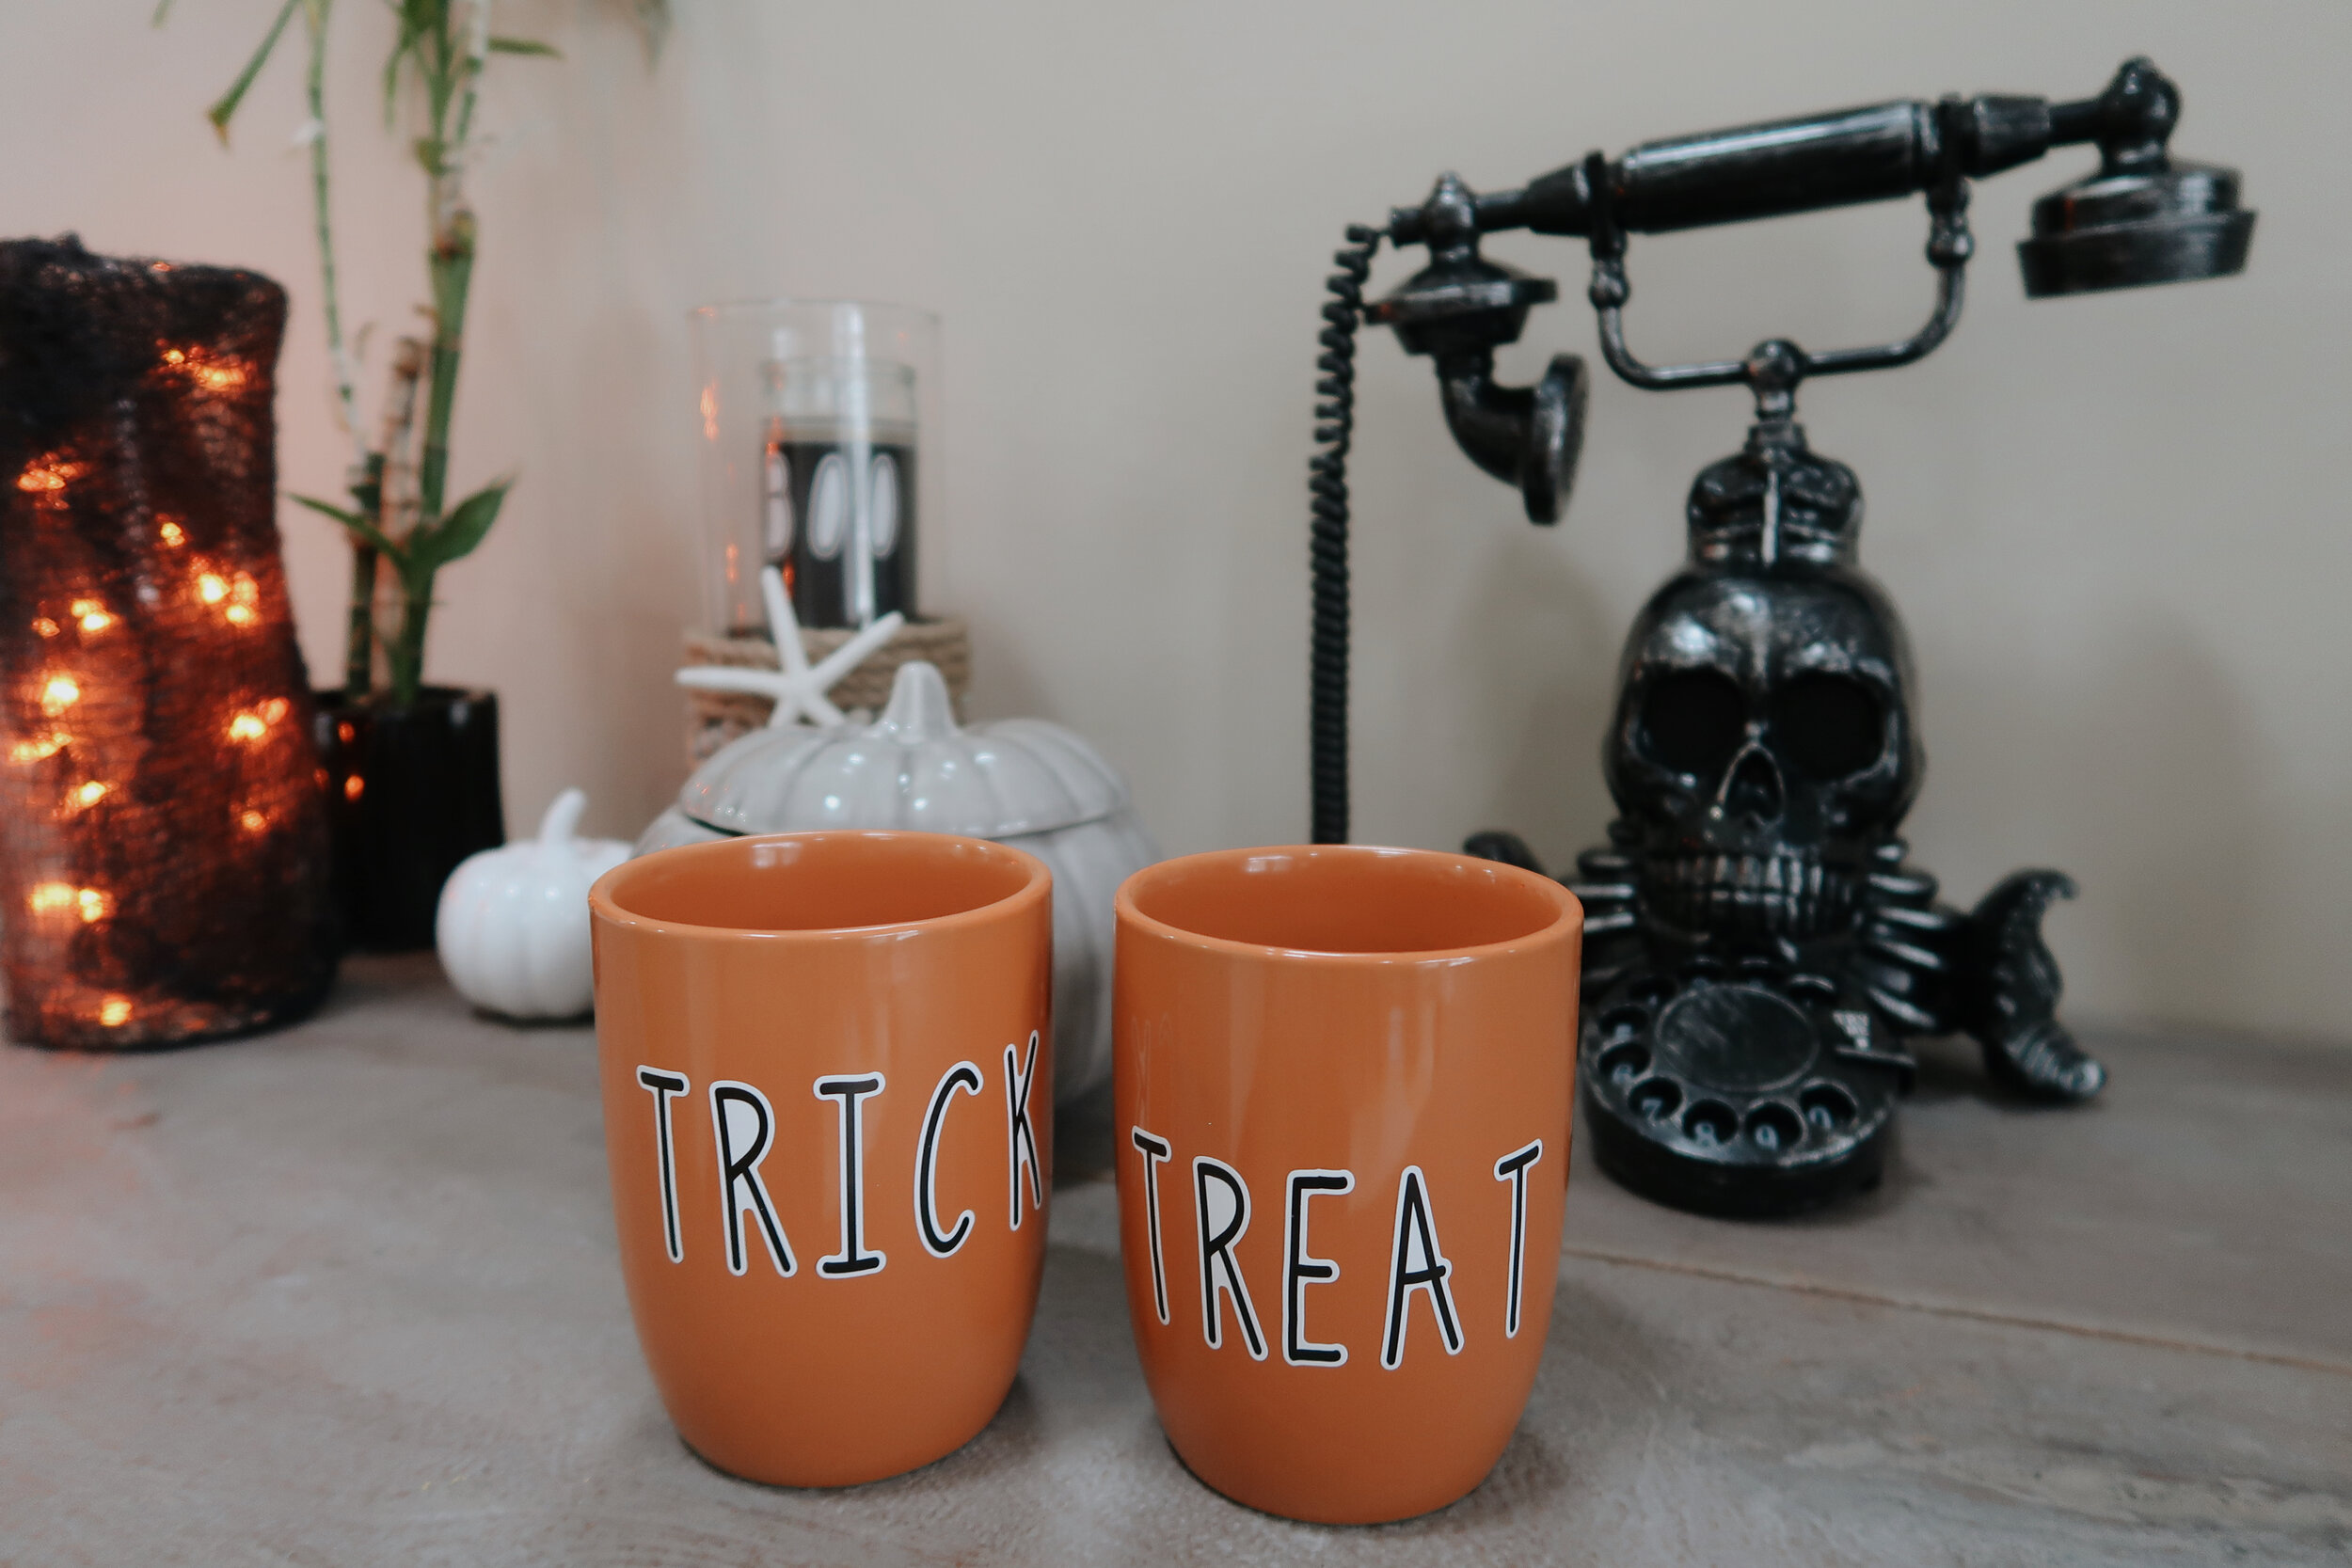 TRICK OR TREAT MUGS -